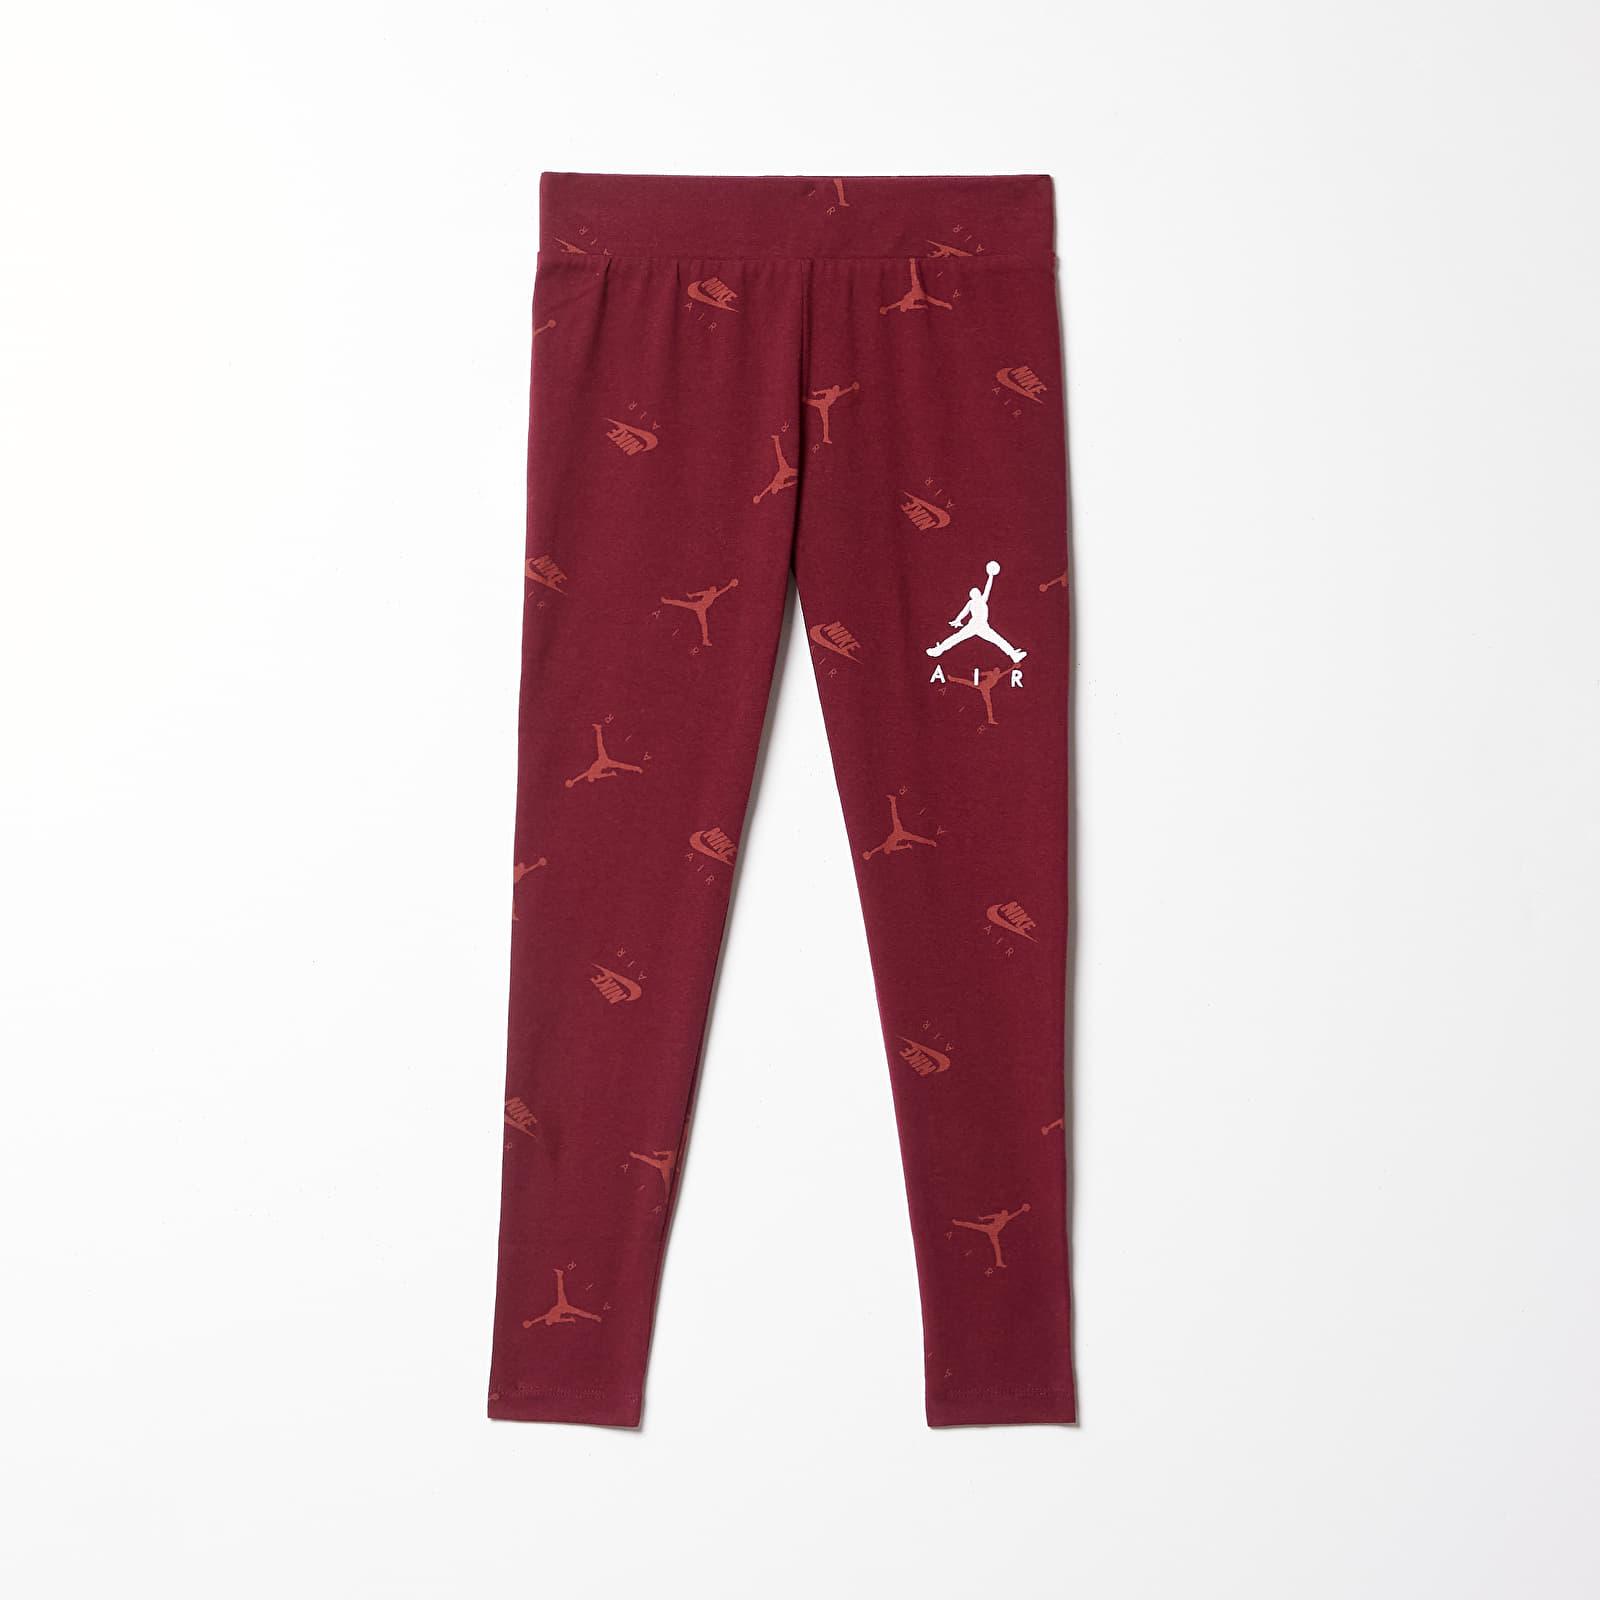 Dětské oblečení Jordan Jdg Jumpman Luxe Court Legging Dark Beetroot